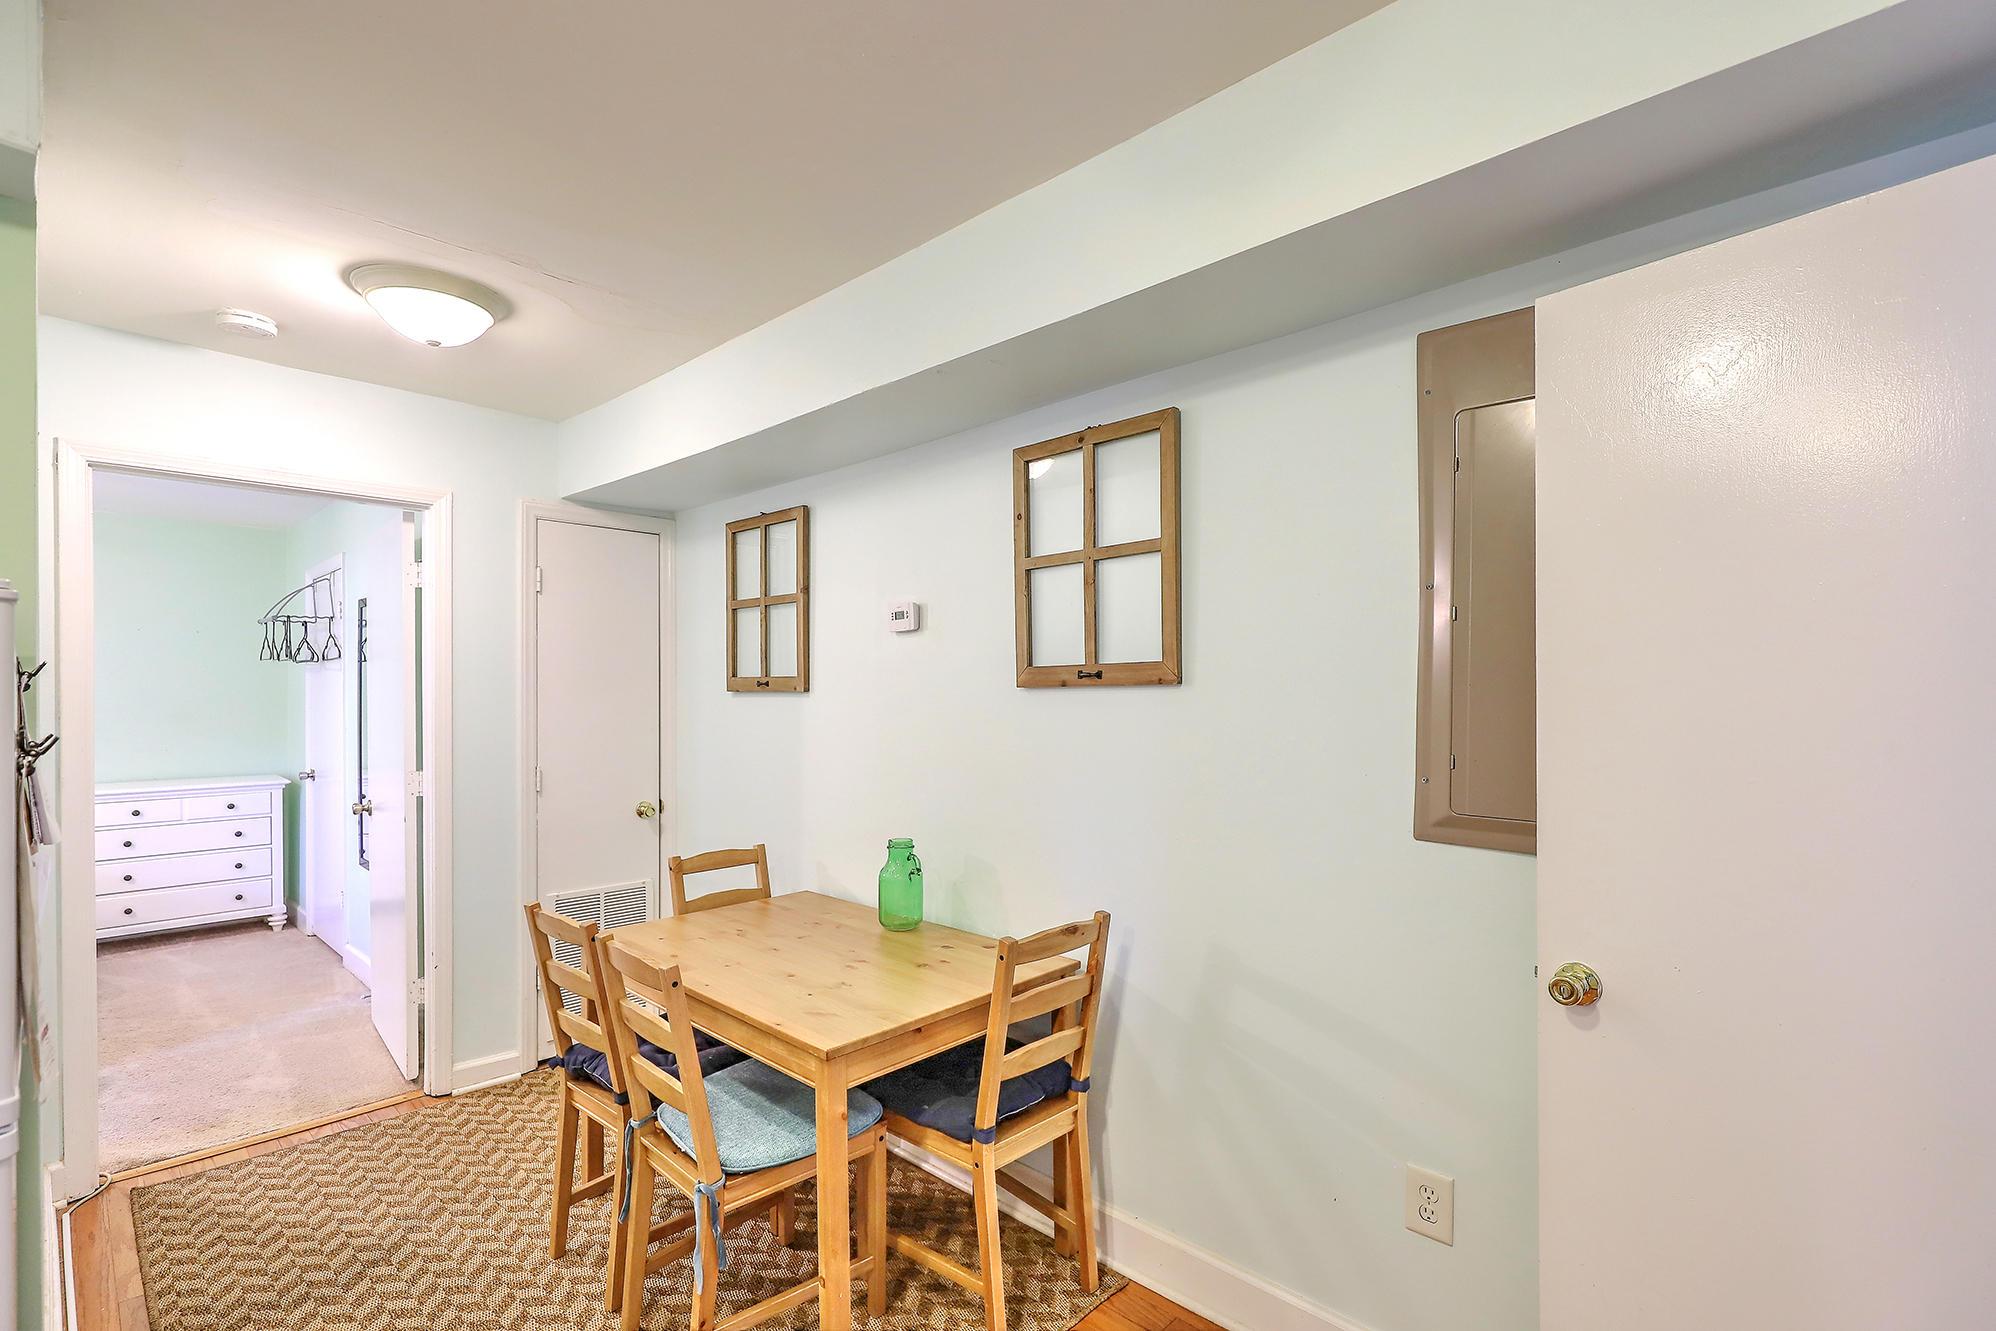 Marsh Grass Condominiums Homes For Sale - 1501 Ben Sawyer, Mount Pleasant, SC - 11